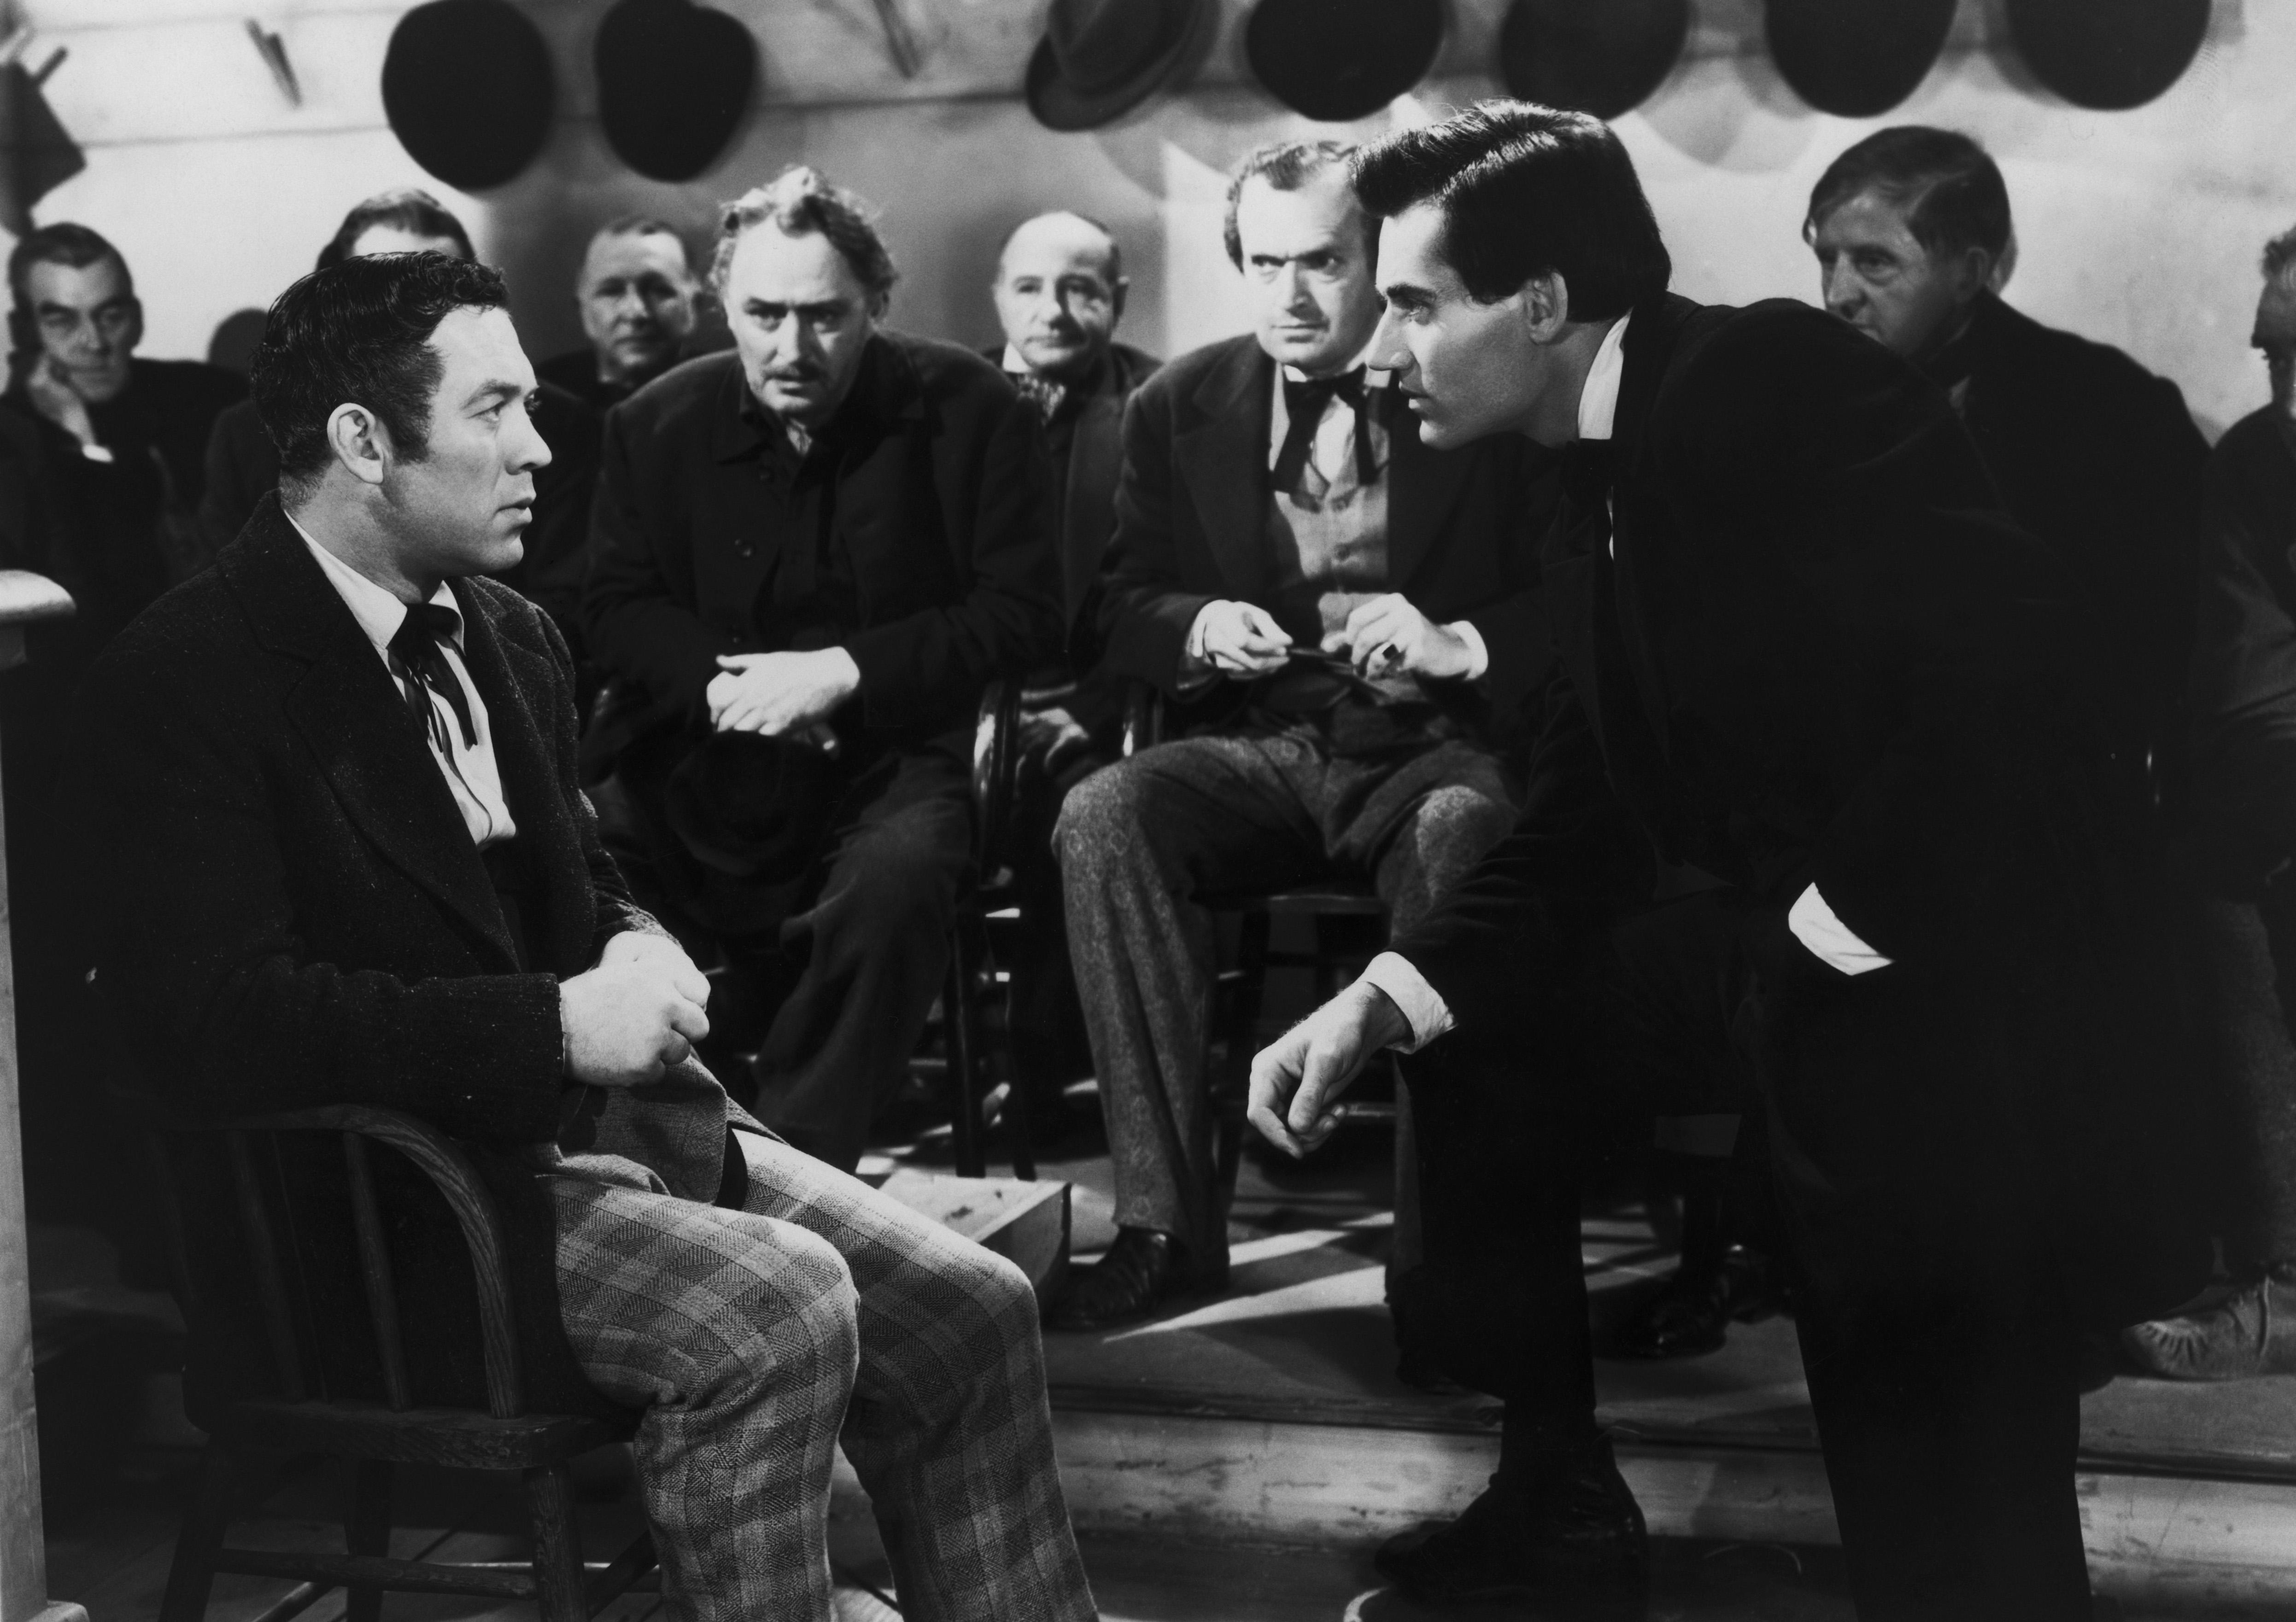 Henry Fonda, Ward Bond, Francis Ford, Jim Mason, and Ivor McFadden in Young Mr. Lincoln (1939)